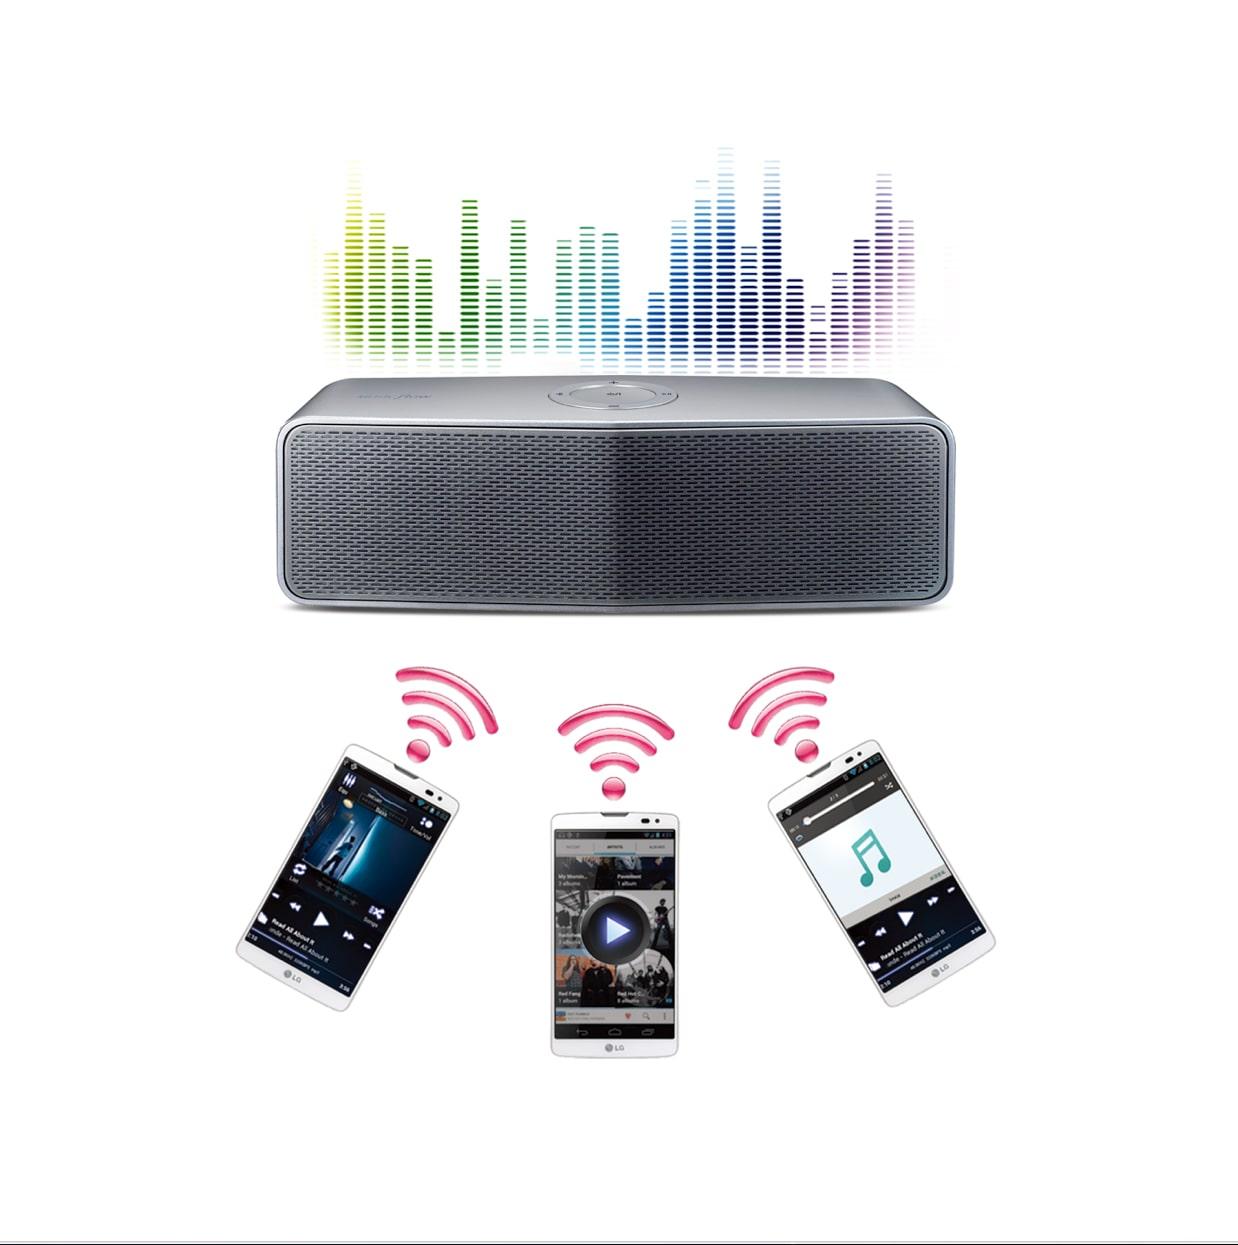 NP7550: LG Music Flow P7 Portable Bluetooth Speaker